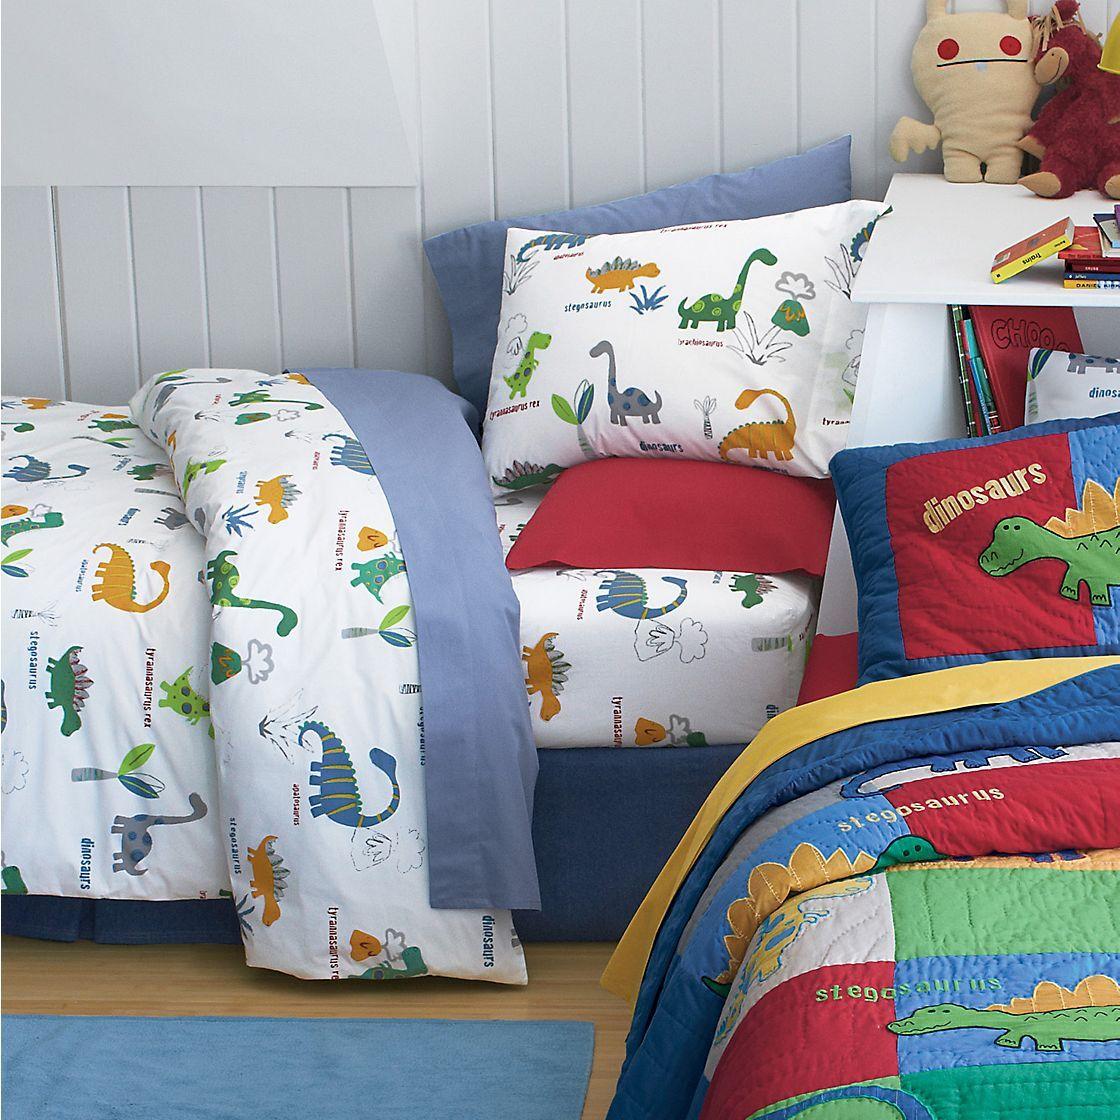 Dino bedding